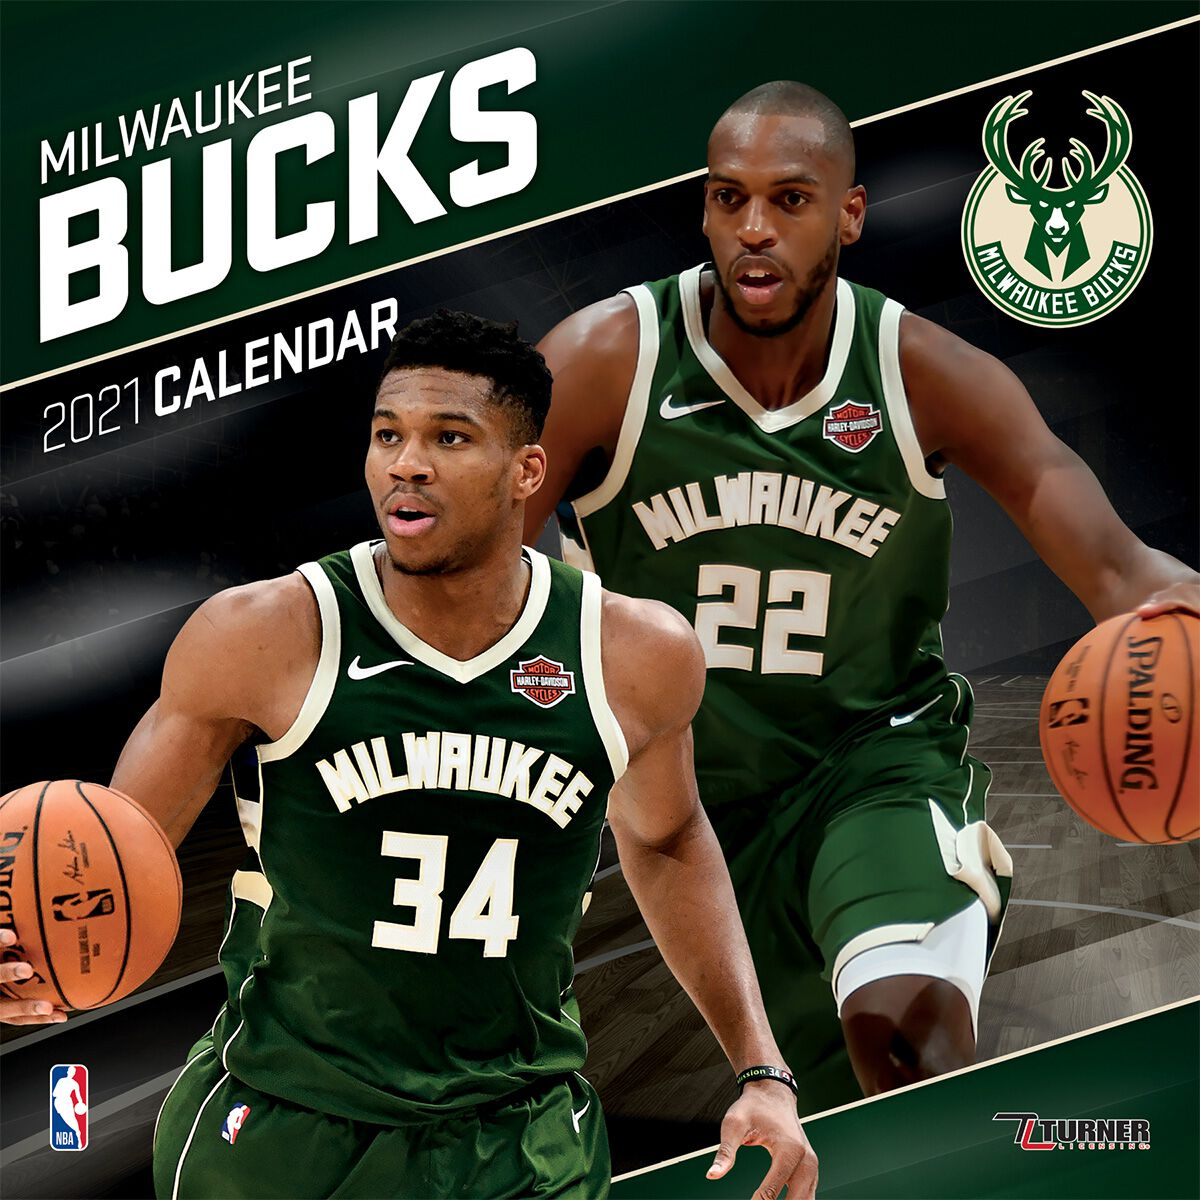 Calendrier 2021 Nba Milwaukee Bucks   Calendrier 2021 | NBA Calendrier mural | EMP